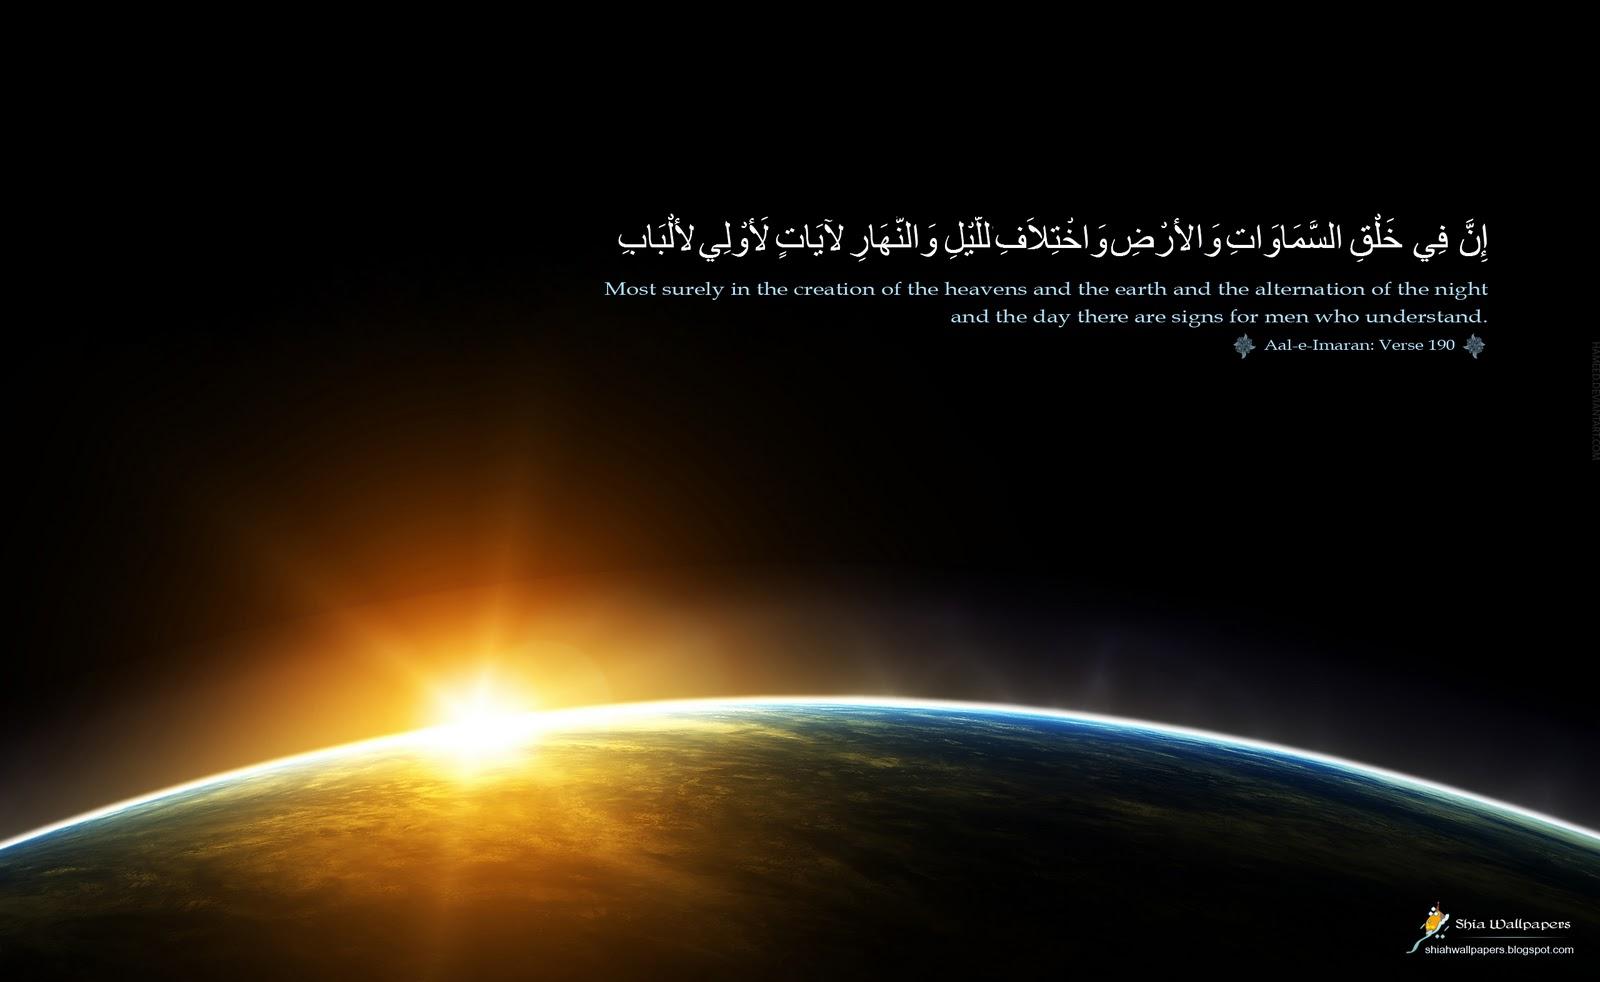 Shia Wallpapers: Quran